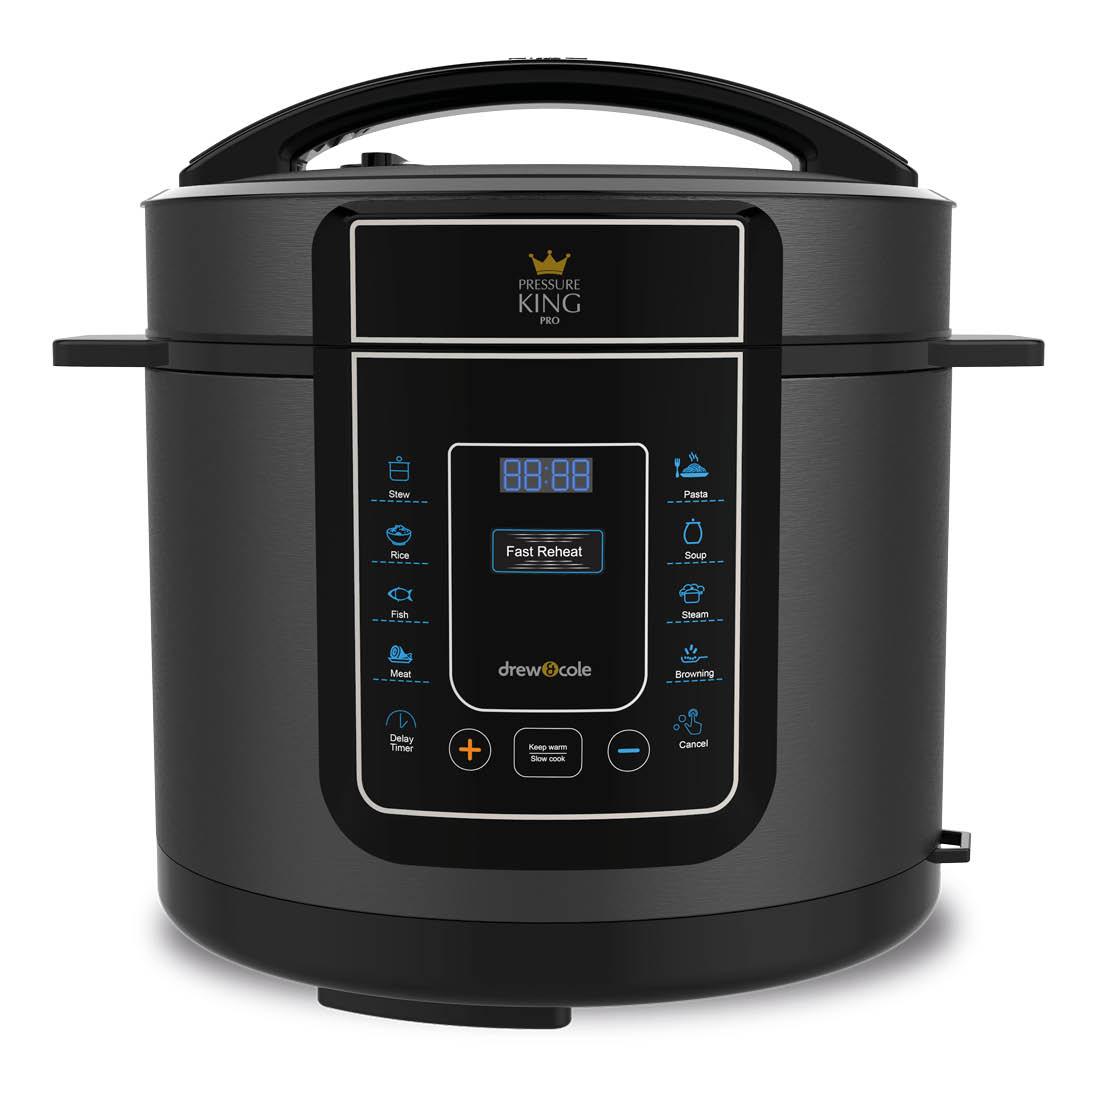 An image of Pressure King Pro 12-in-1 5L Digital Pressure Cooker – Black